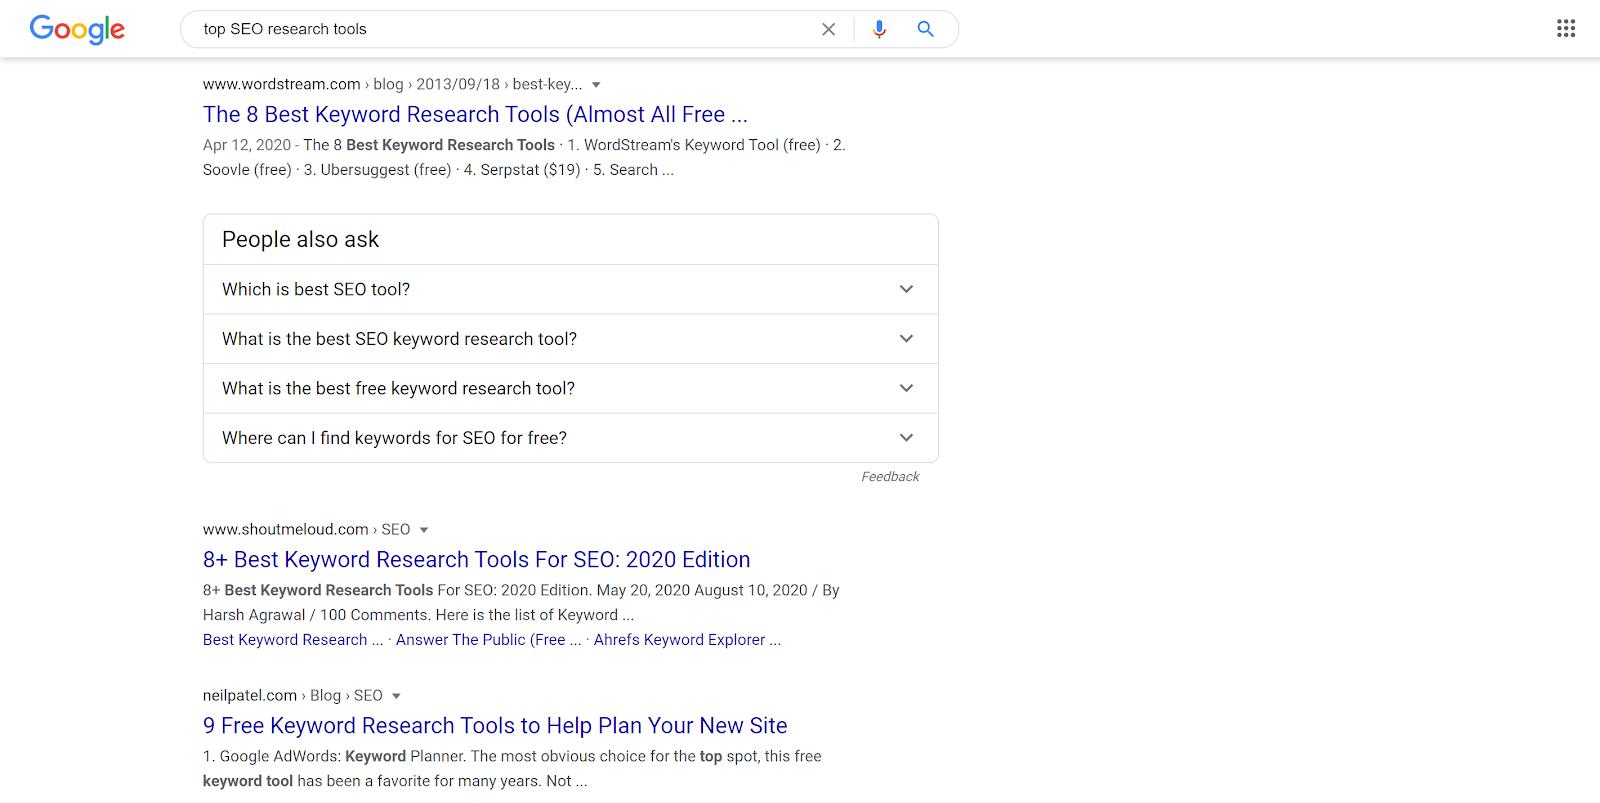 Top SEO research tools